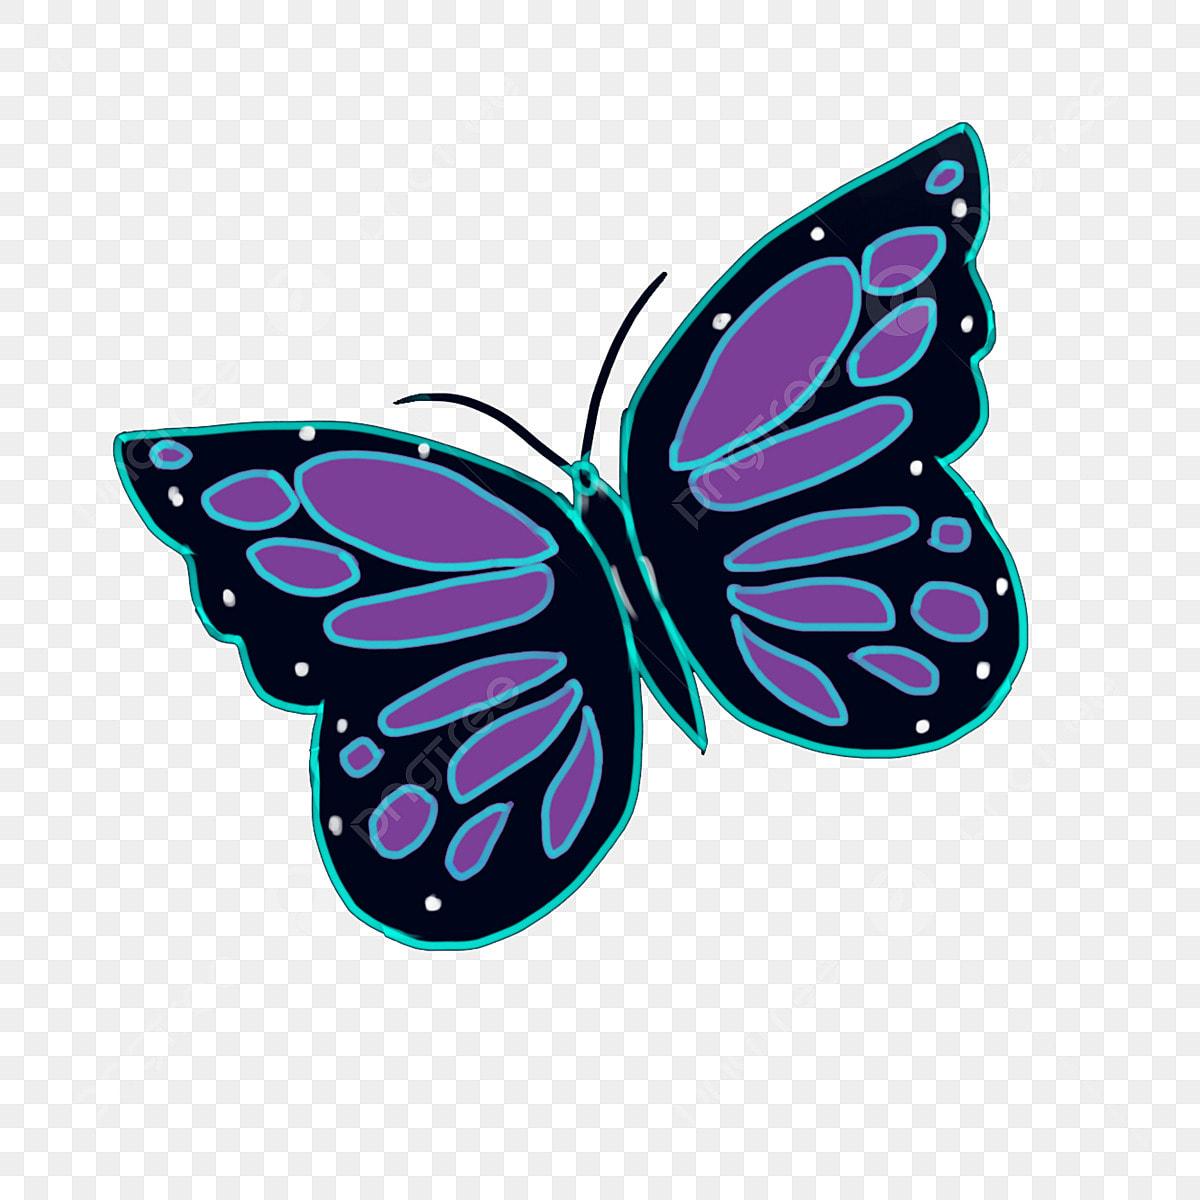 Dibujado A Mano Colorear Mariposa Dibujos Animados Dibujado